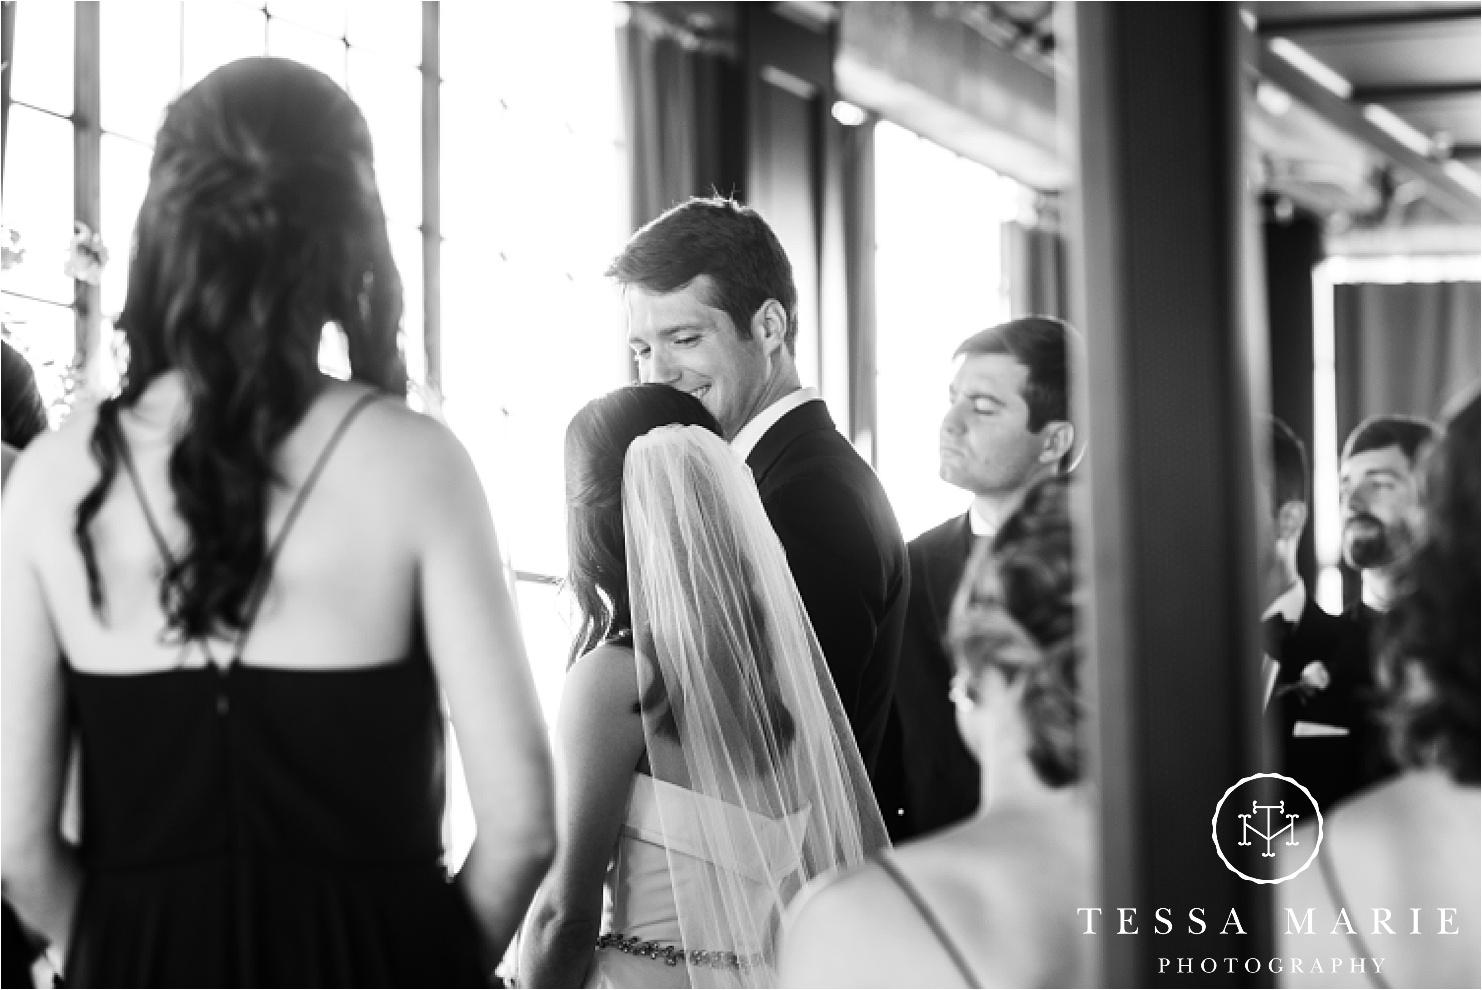 Tessa_marie_weddings_houston_wedding_photographer_The_astorian_0116.jpg